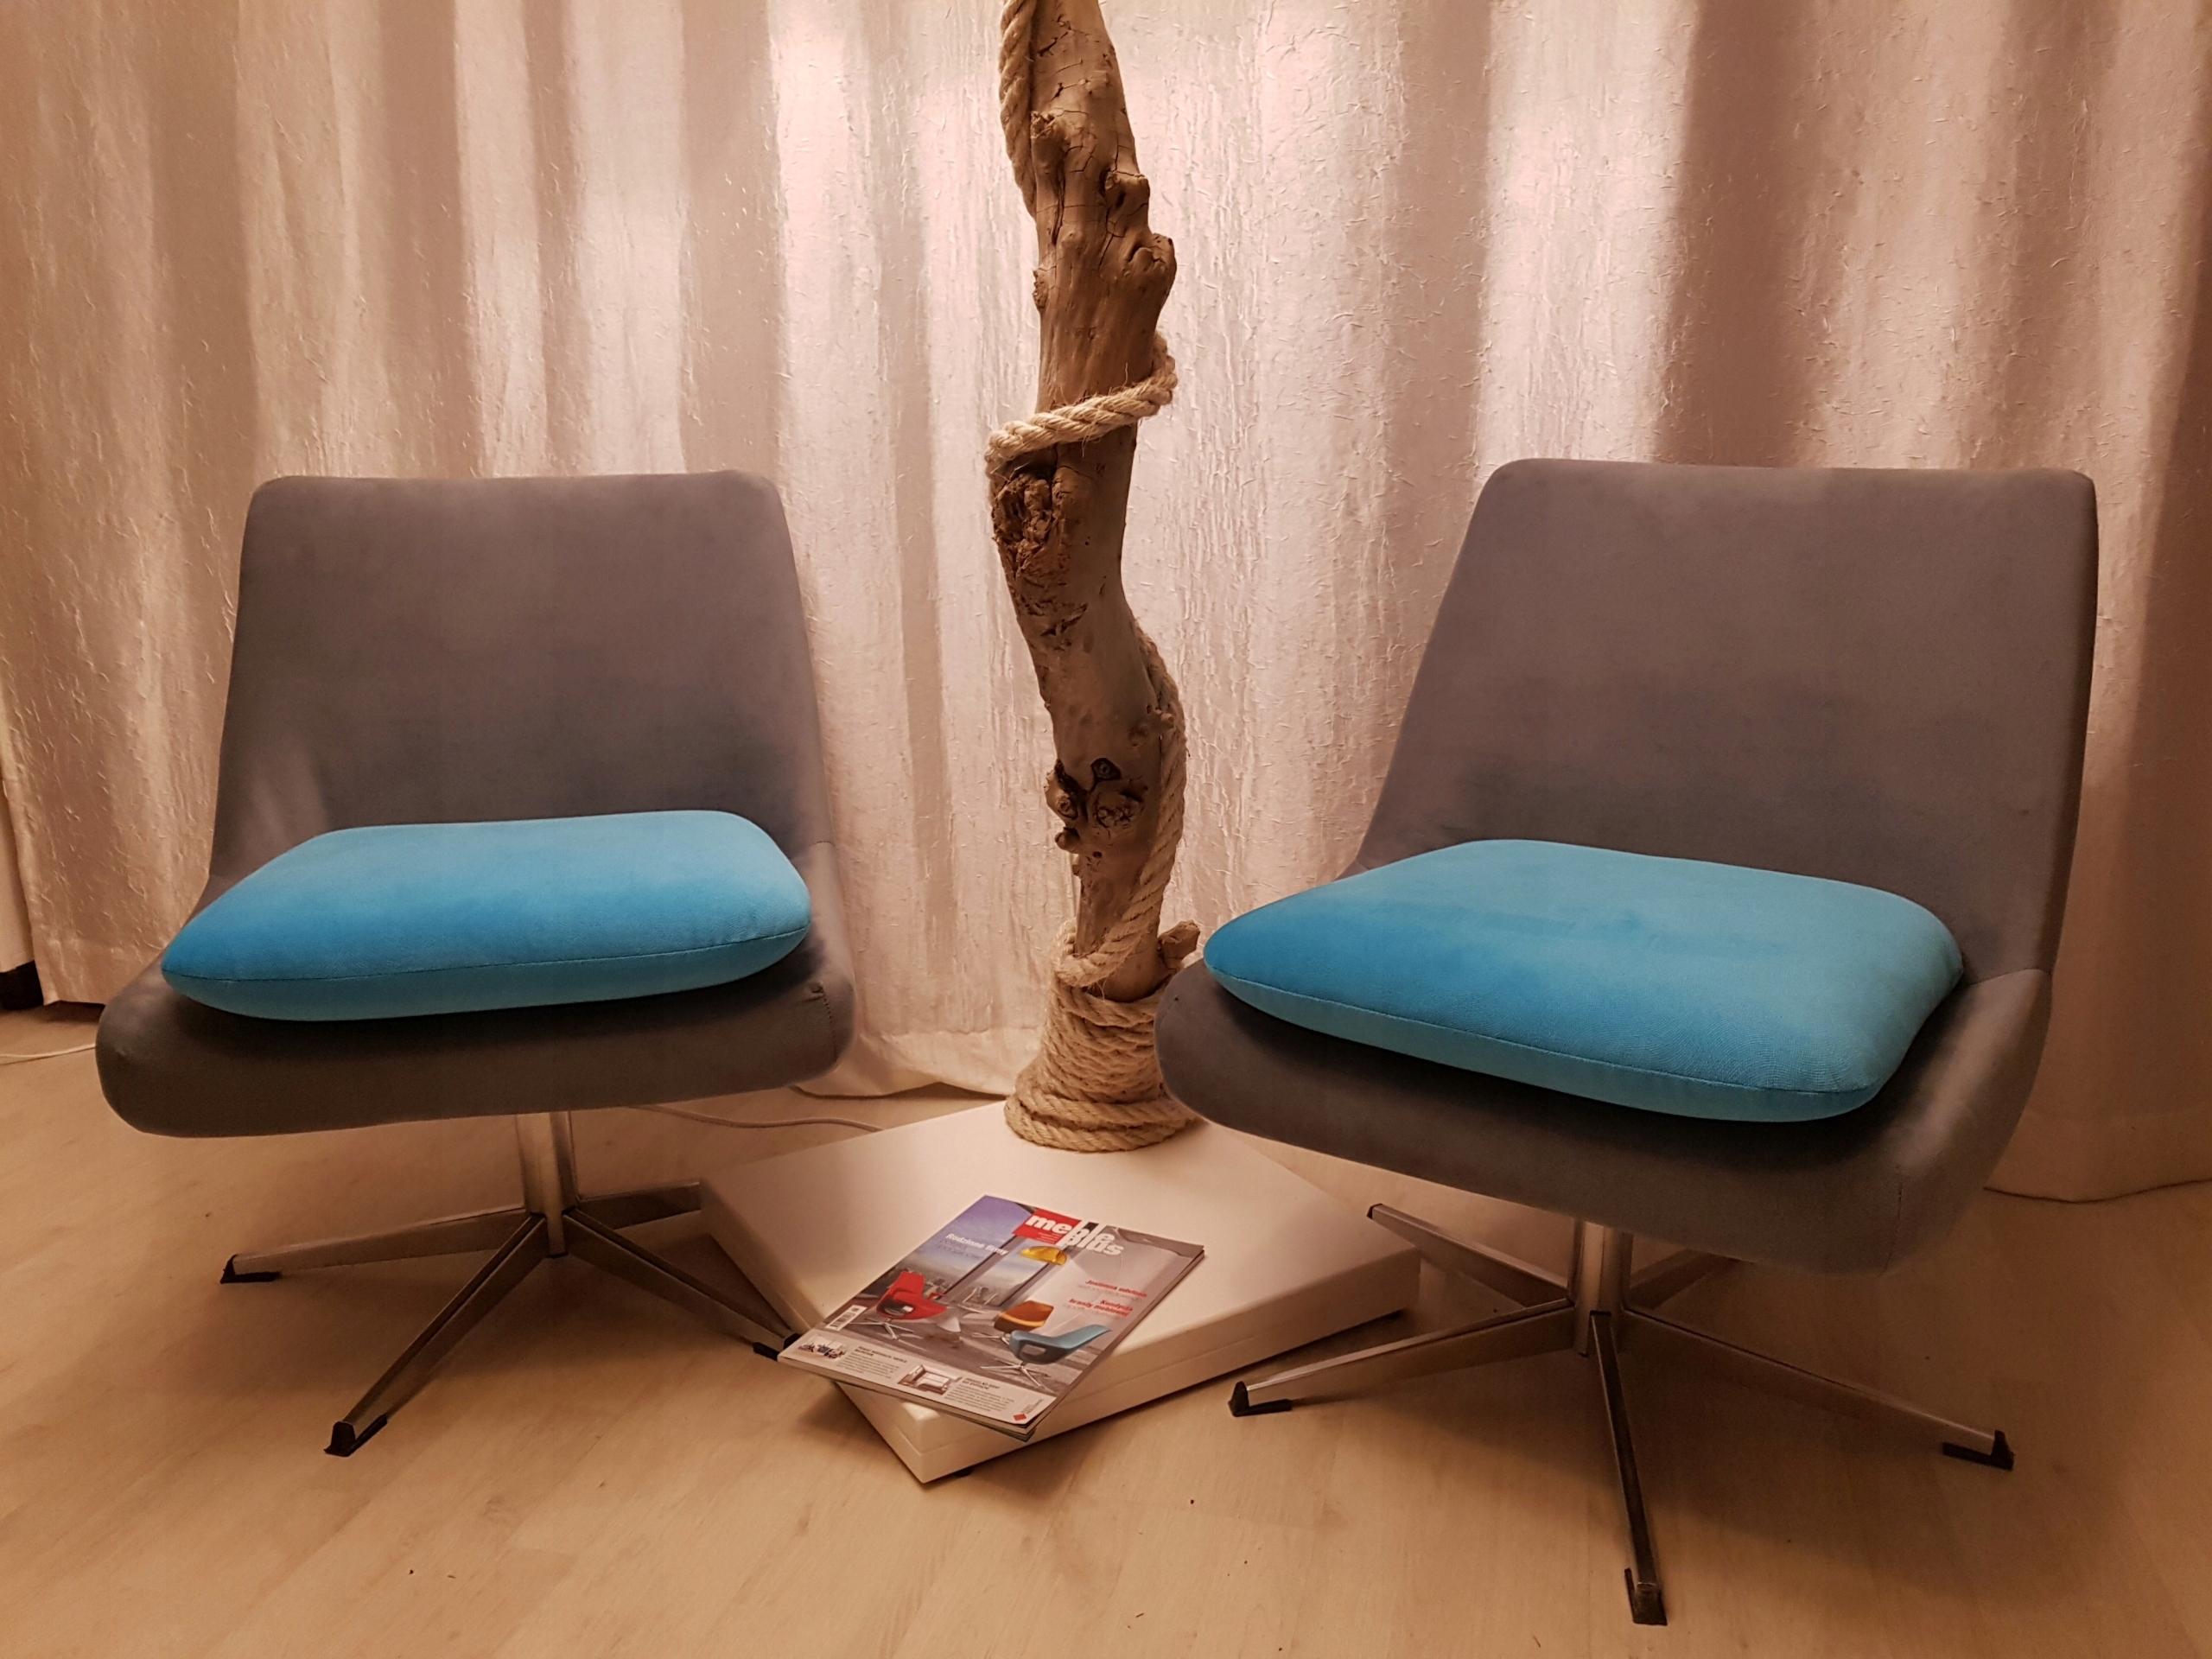 Fotel Klubowy Obrotowy Muszelka Loft Prl 7535386127